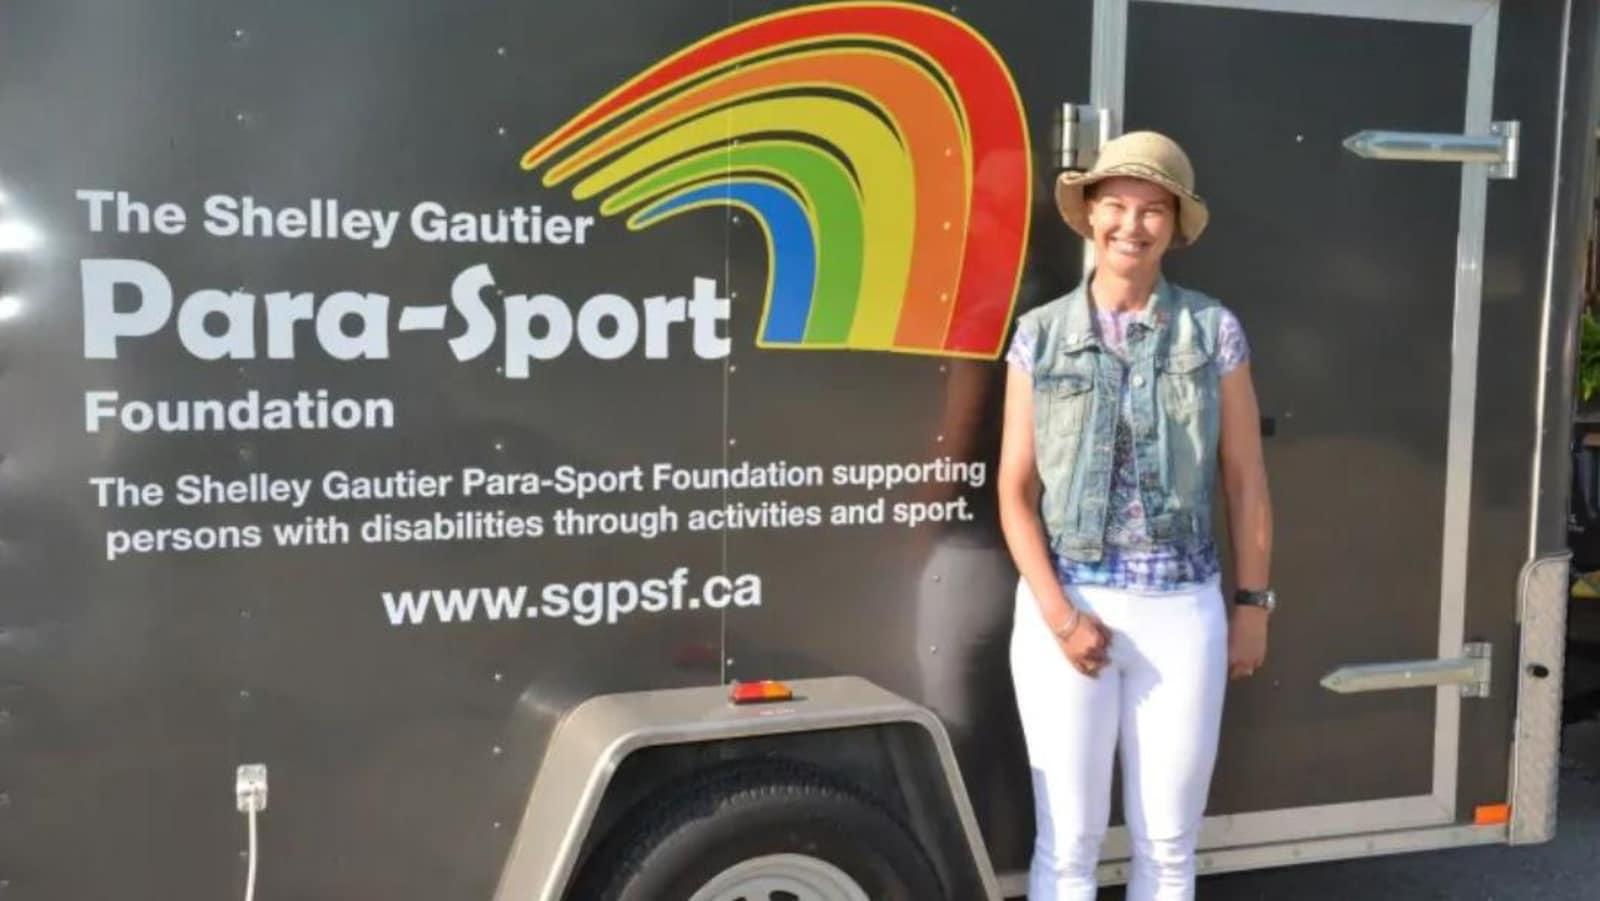 La paracycliste Shelley Gautier devant le logo de sa fondation.